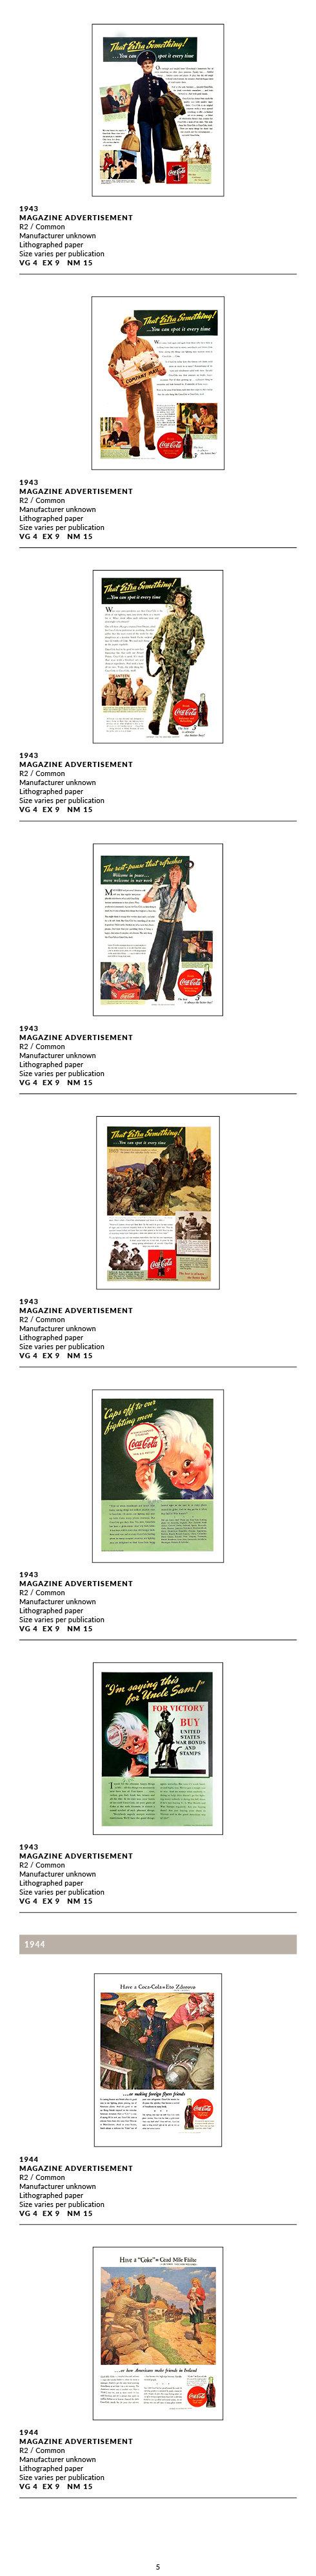 1940-45 Ads_5.jpg